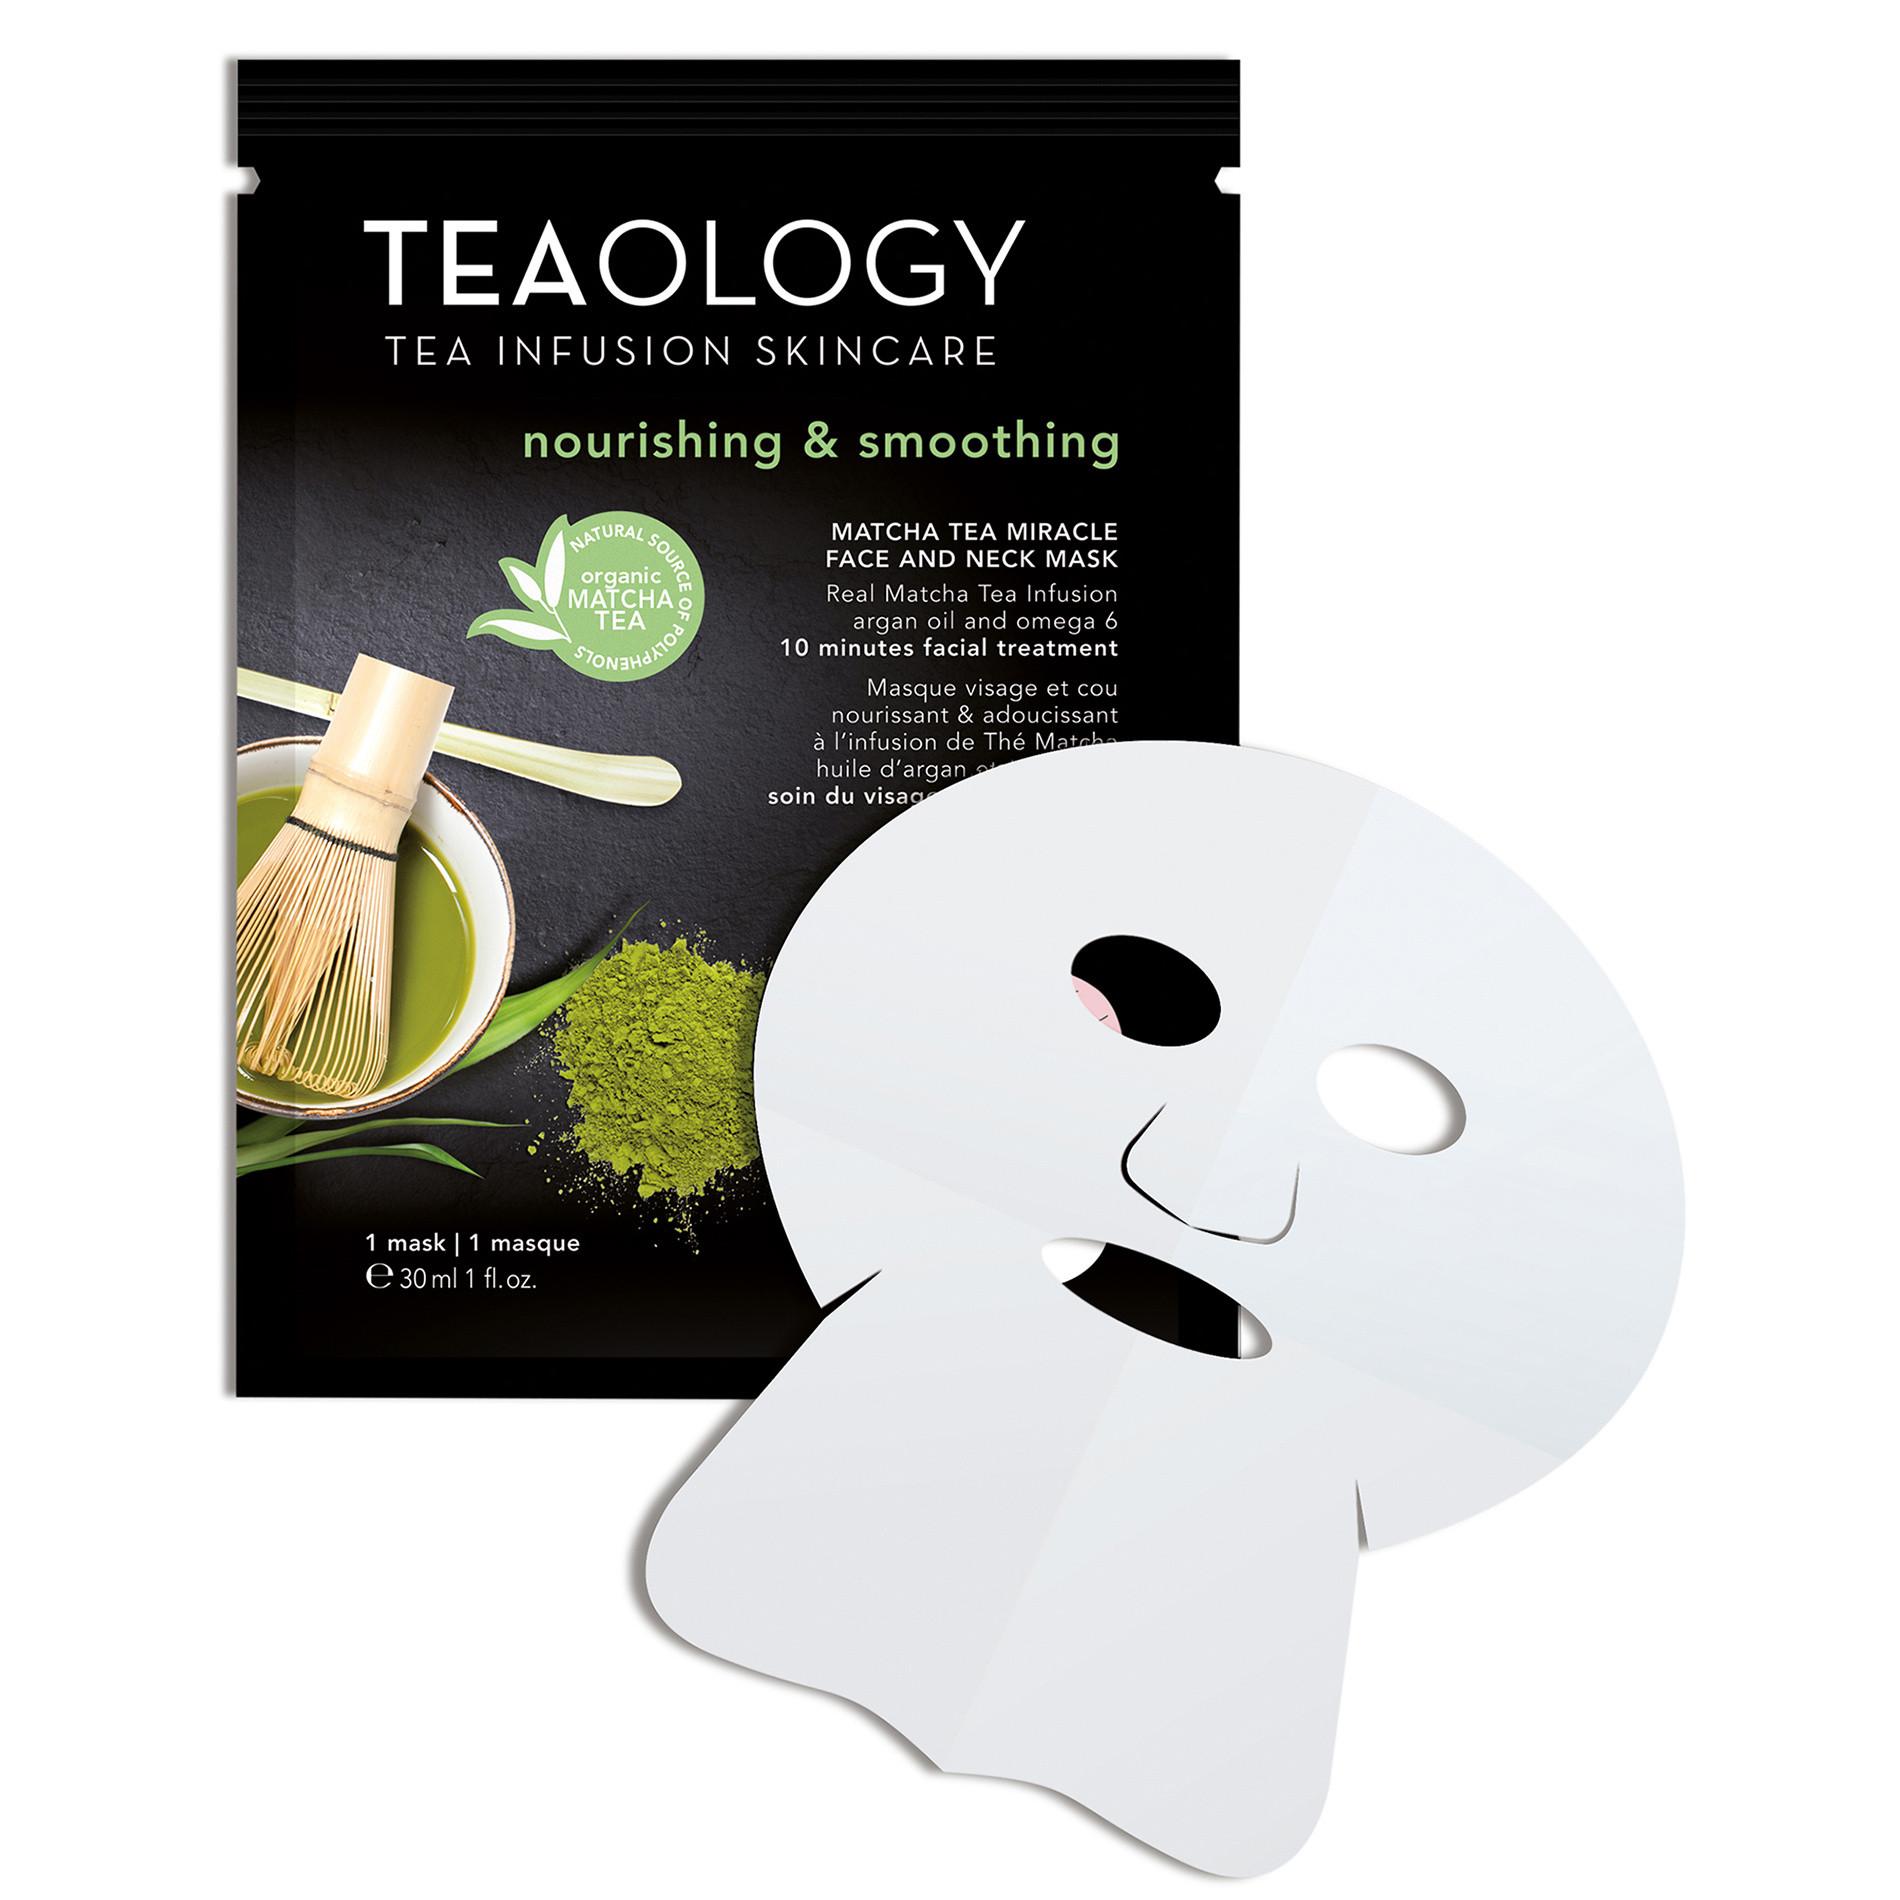 Matcha Tea Miracle Face and Neck Mask Nutriente e Levigante 30 ml, Nero, large image number 1